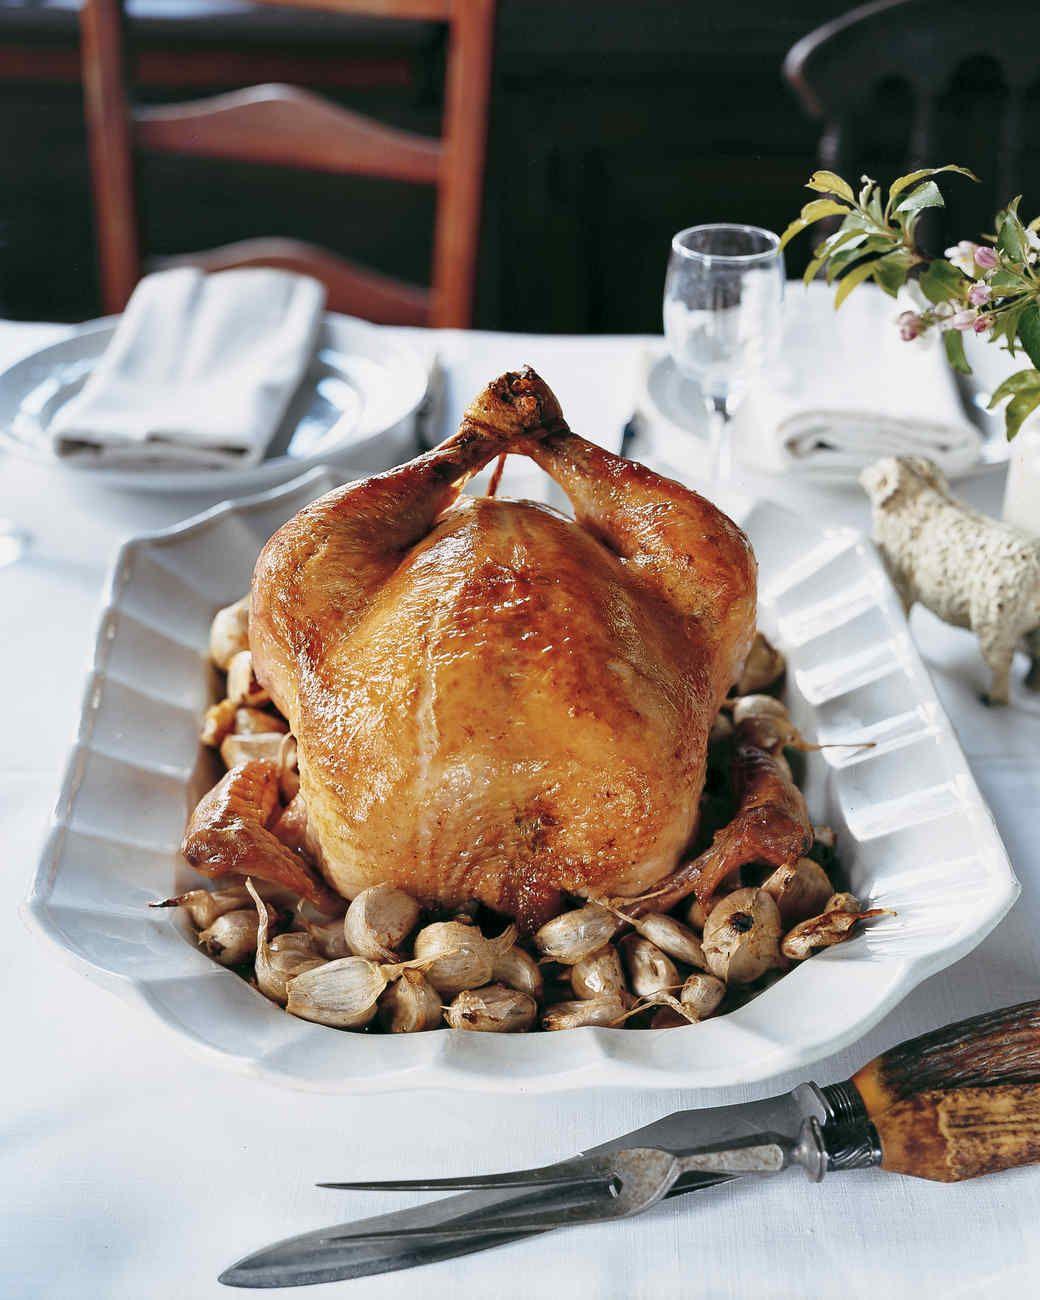 60-Clove Garlic Chicken | Martha Stewart Living - The garlic mellows as it cooks, deliciously accenting succulent roast chicken.